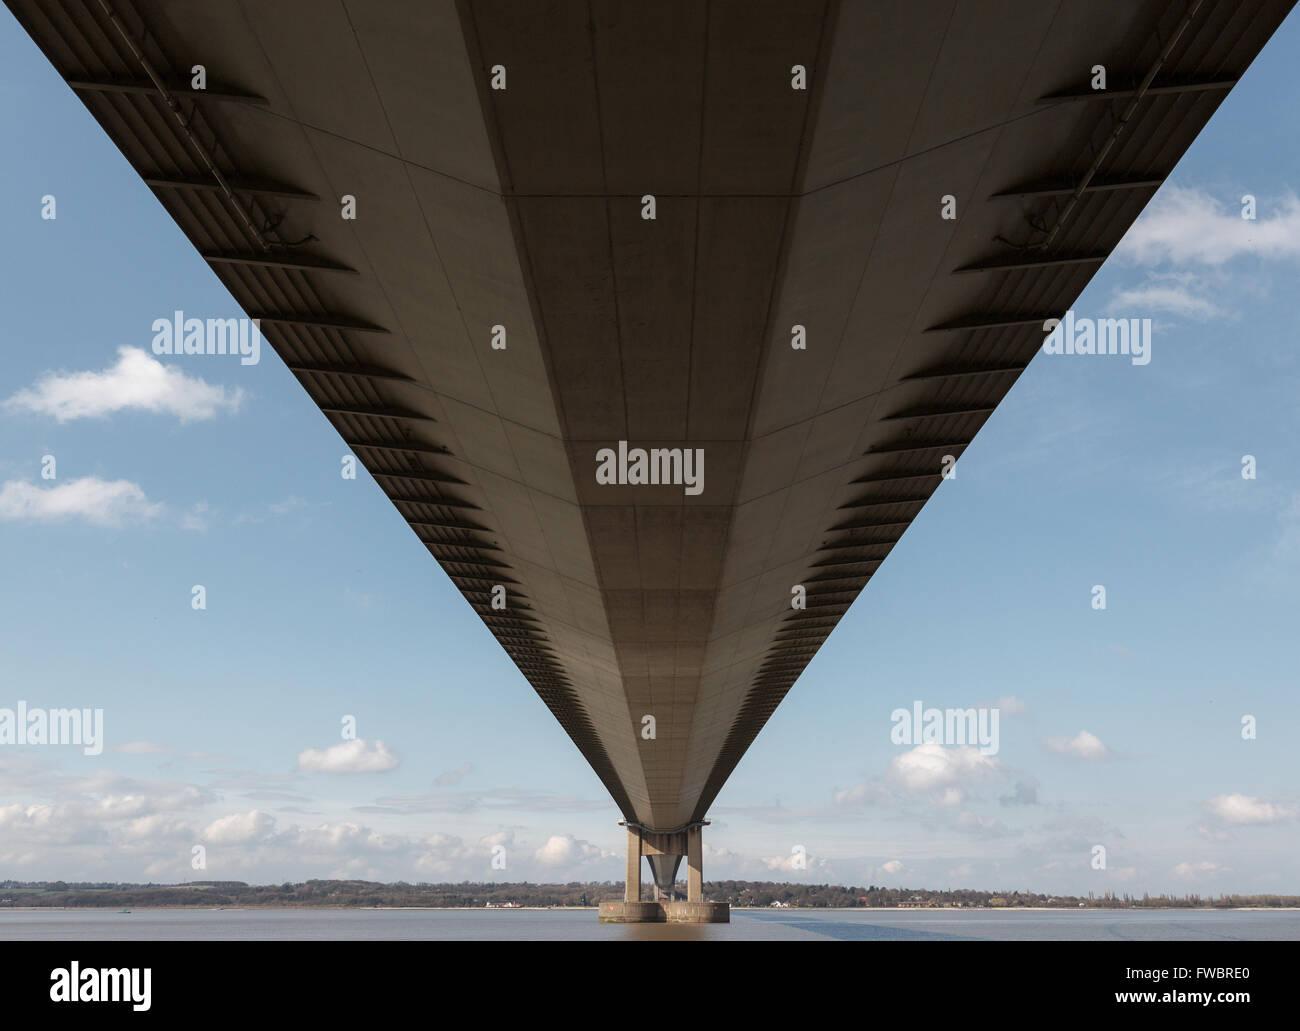 Under Humber Bridge - Stock Image